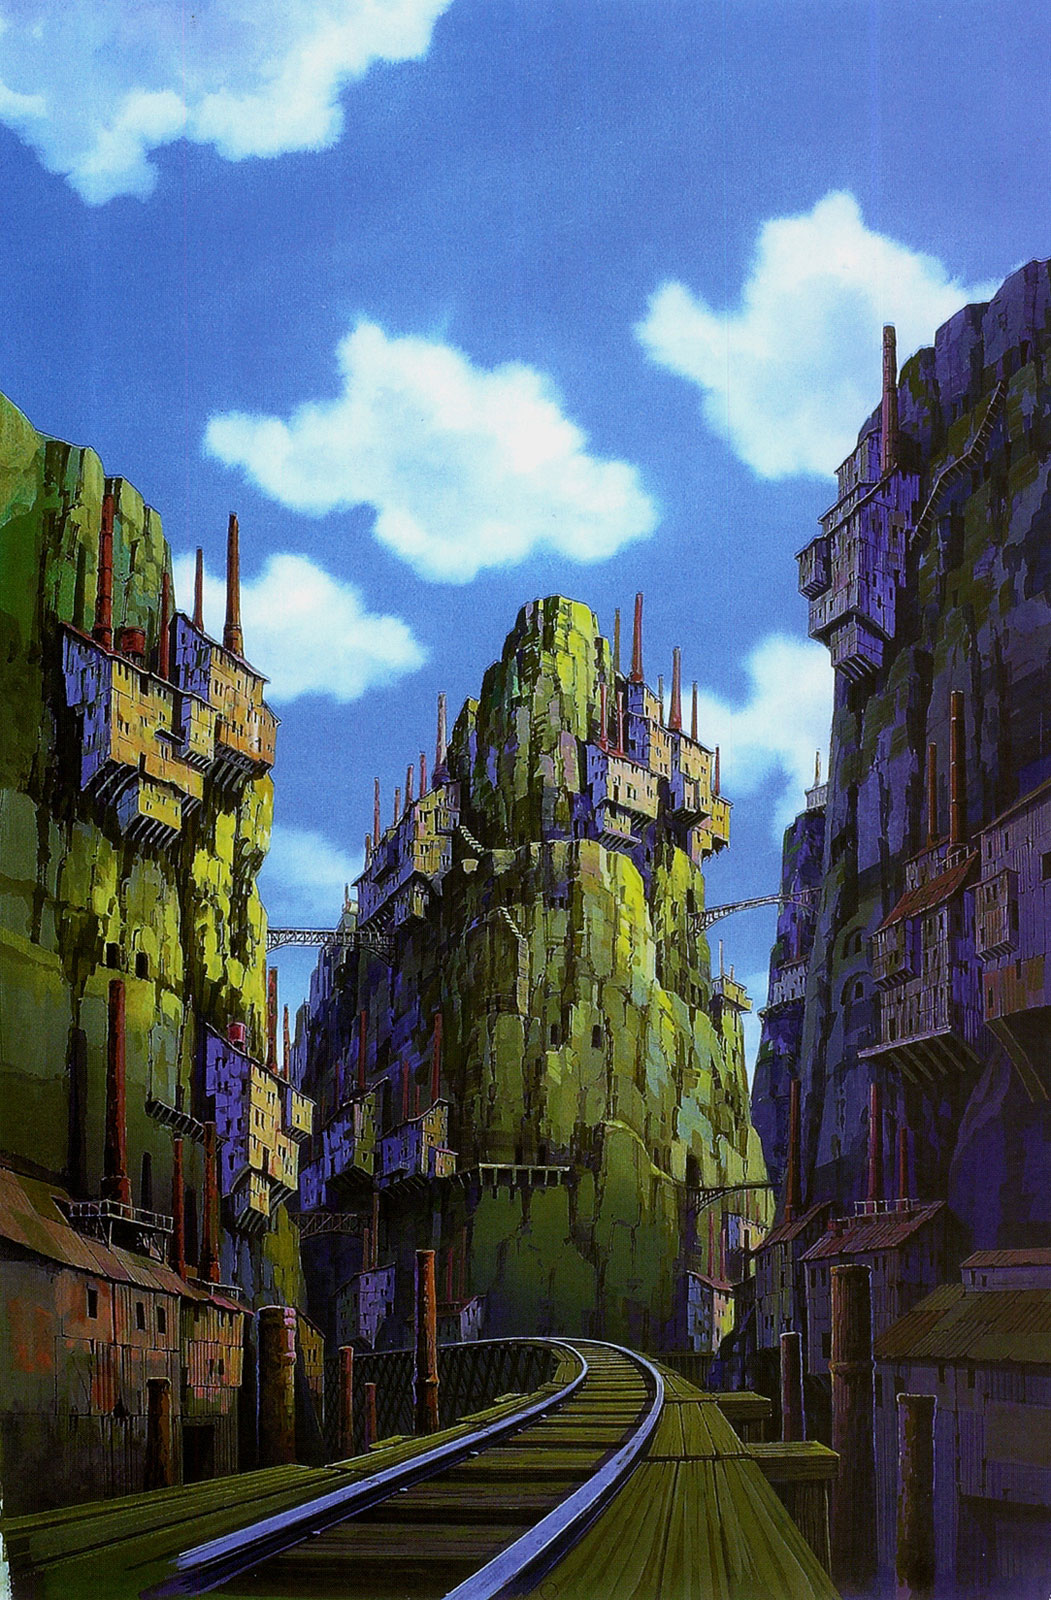 Castle in the Sky | Studio ghibli art, Castle in the sky ...